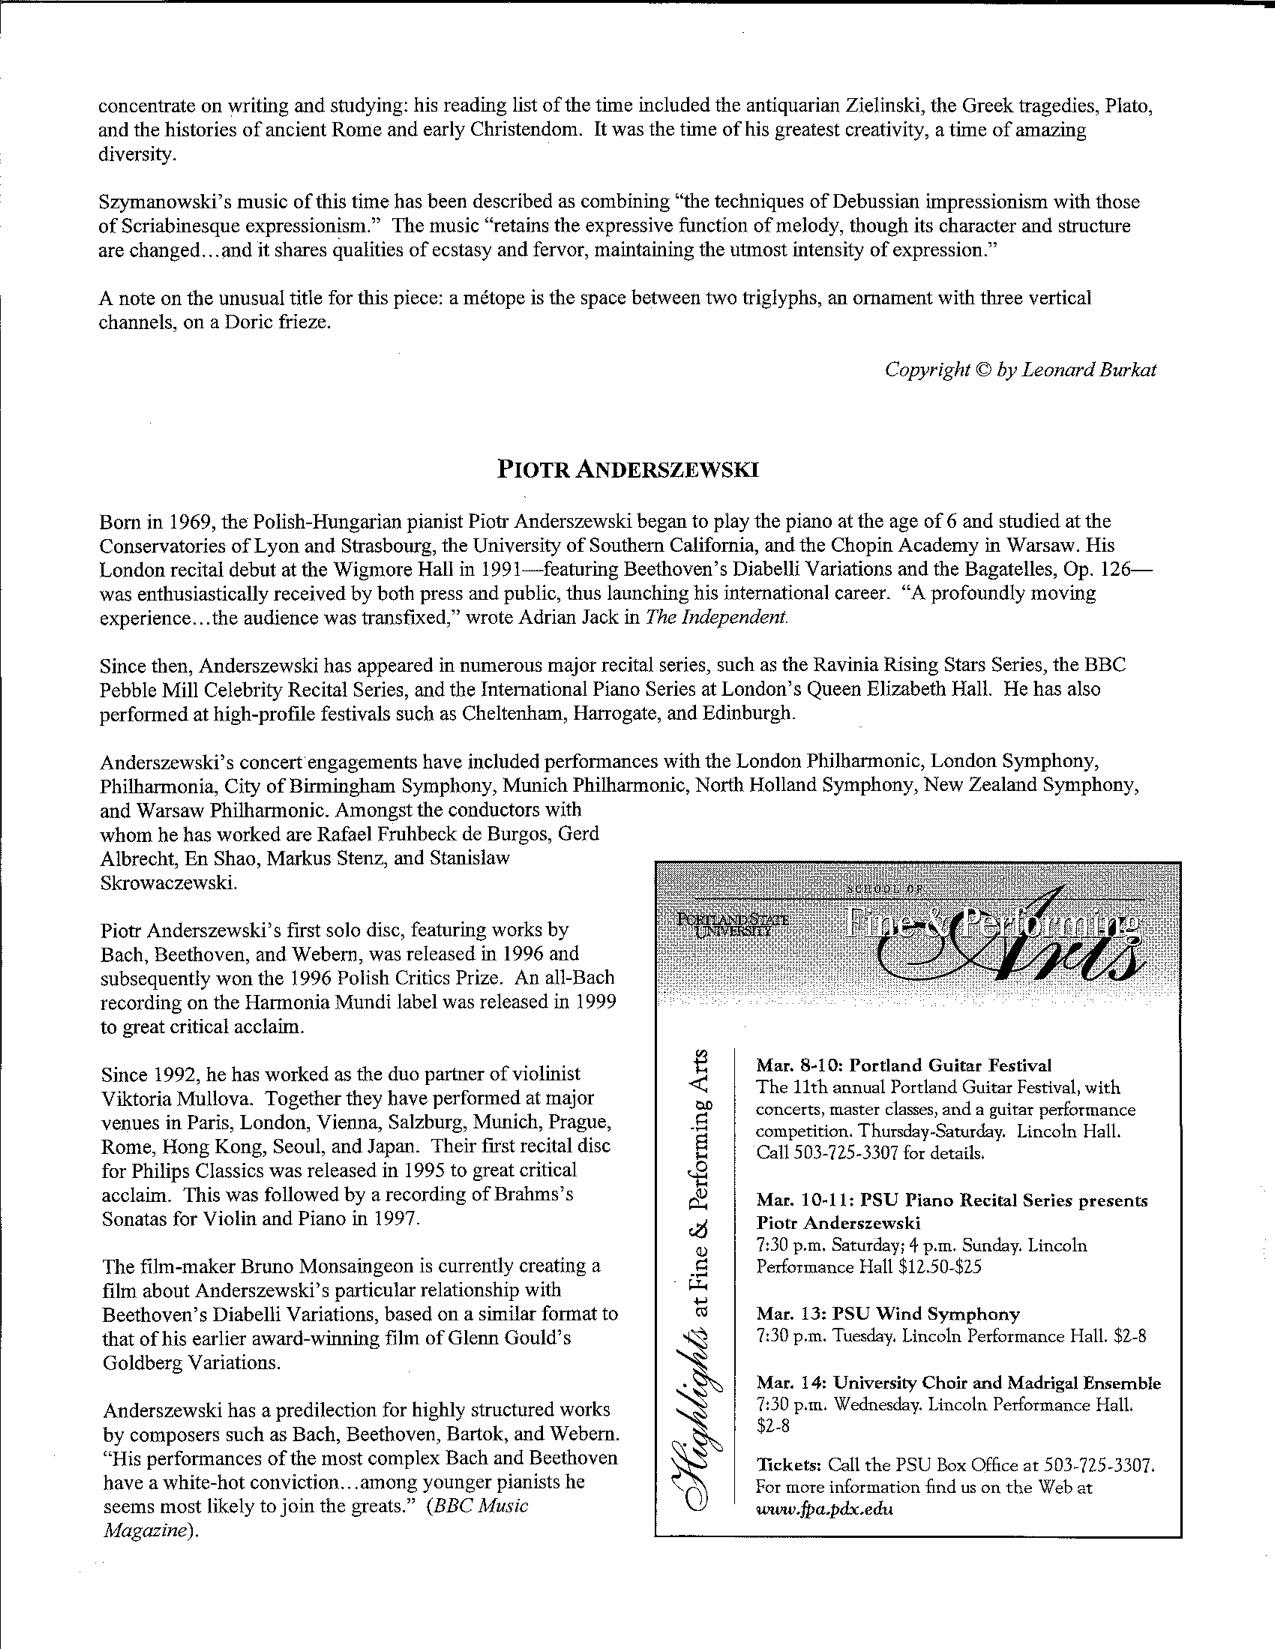 Anderszewski00-01_Program6.jpg